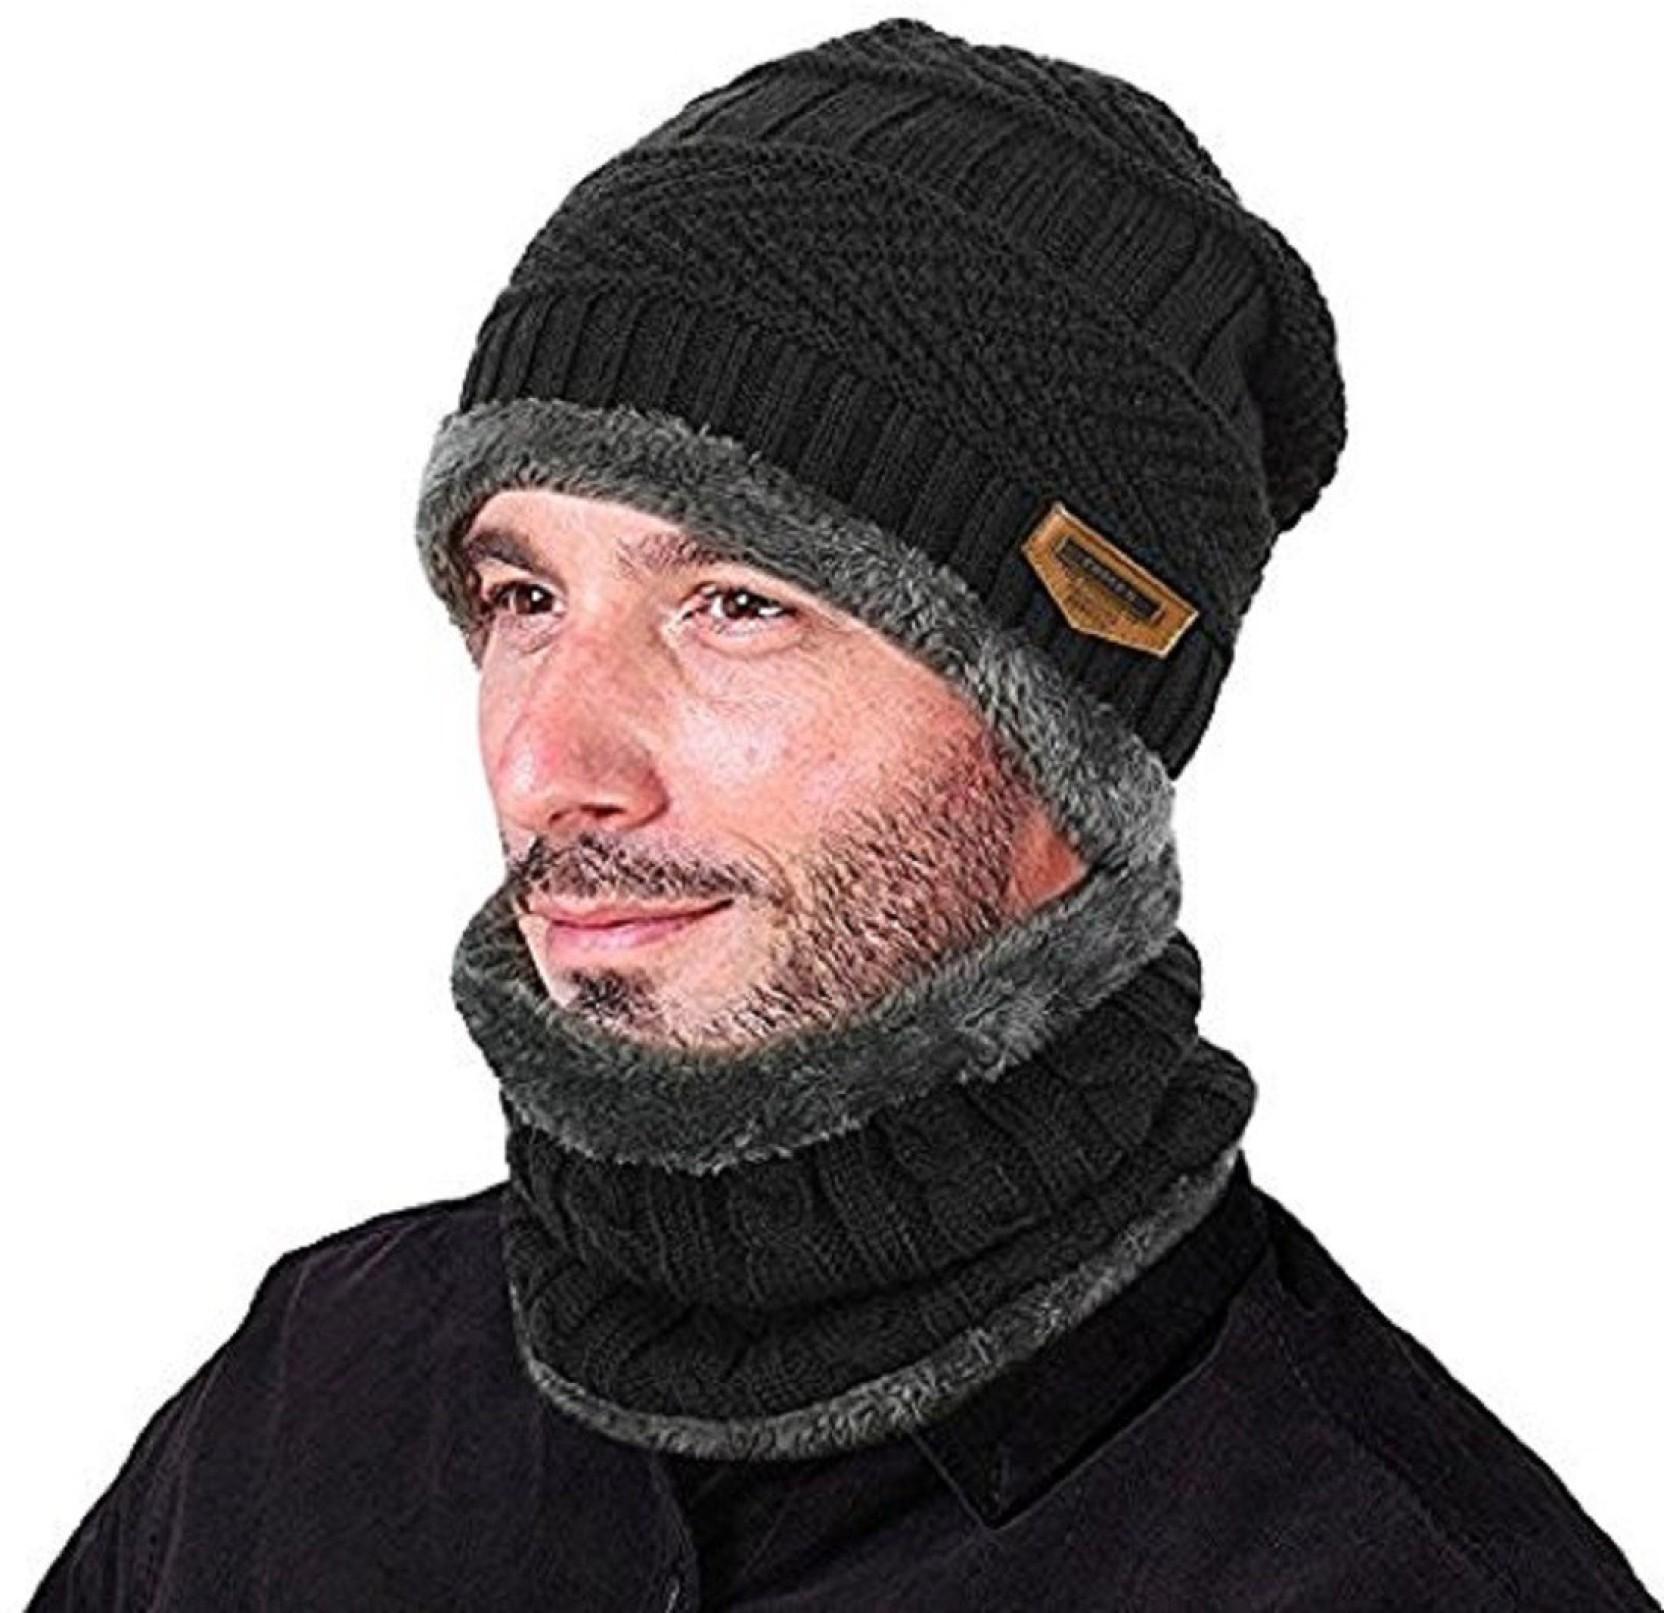 4db8f3cc14 Aeoss 2-Pieces Winter Beanie Hat Scarf Set Warm Knit Hat Thick Knit Skull  Cap. Home